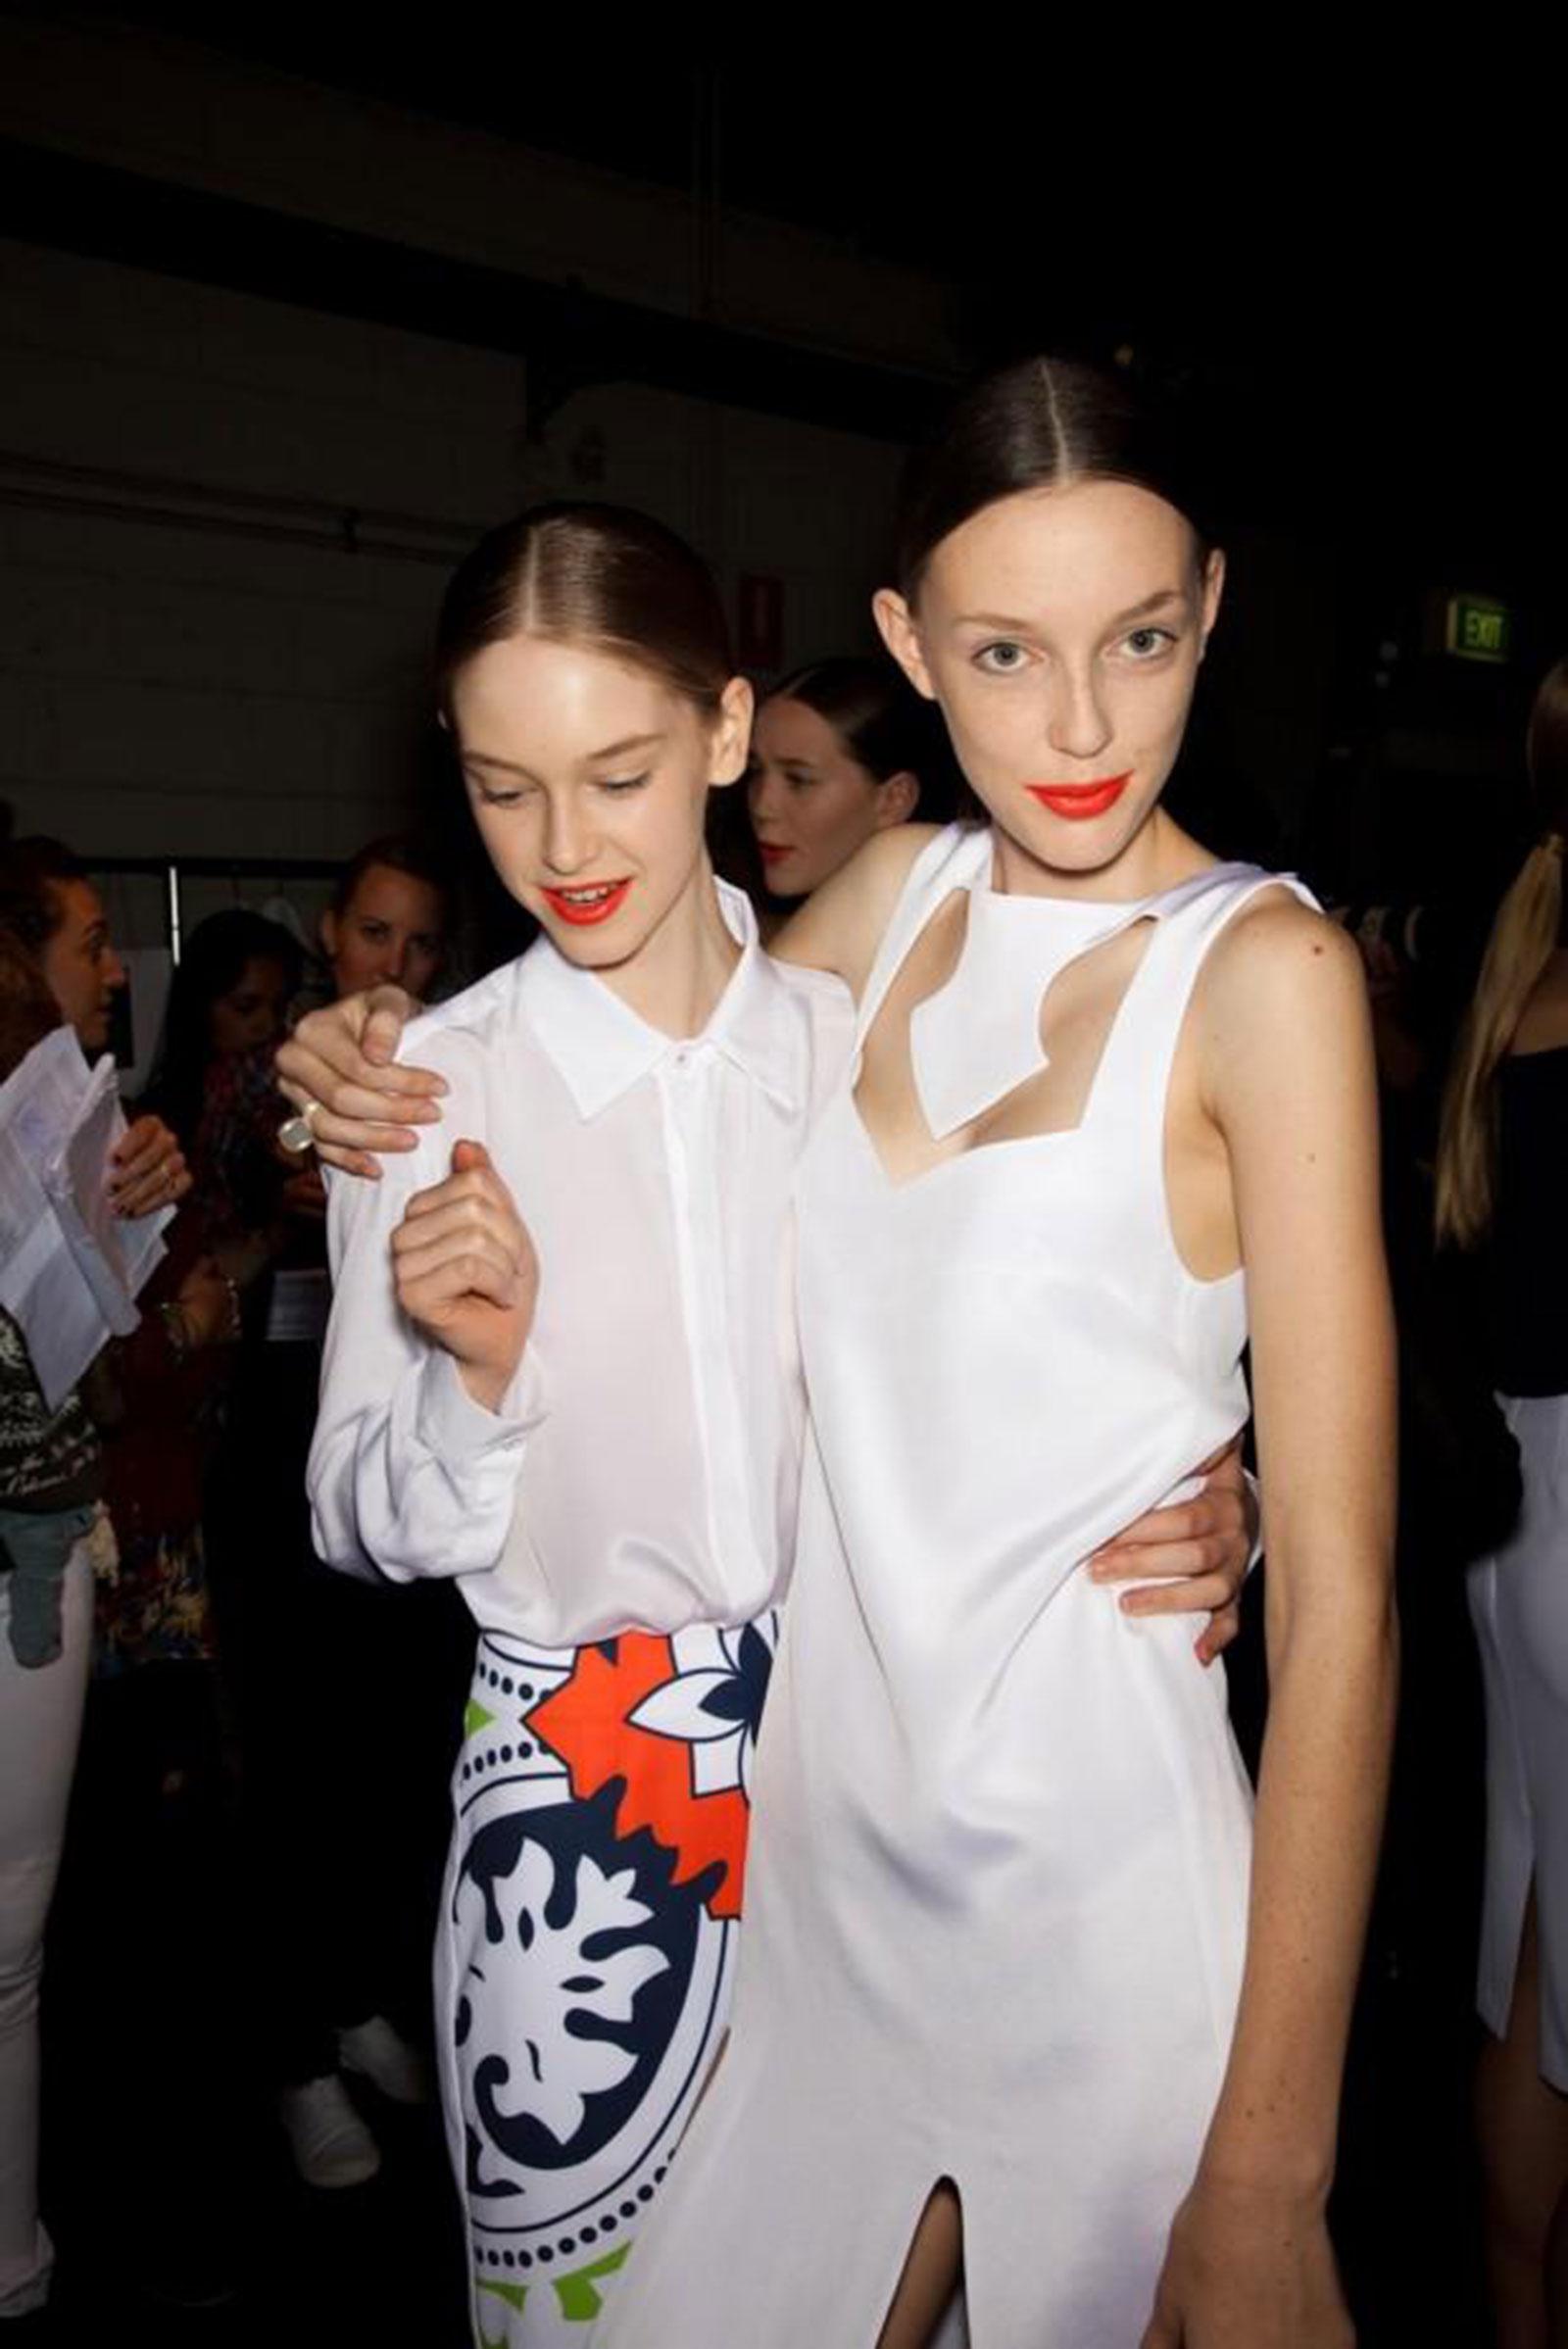 The_Ink_Collecive_Australian_Fashion_2011_1.jpg